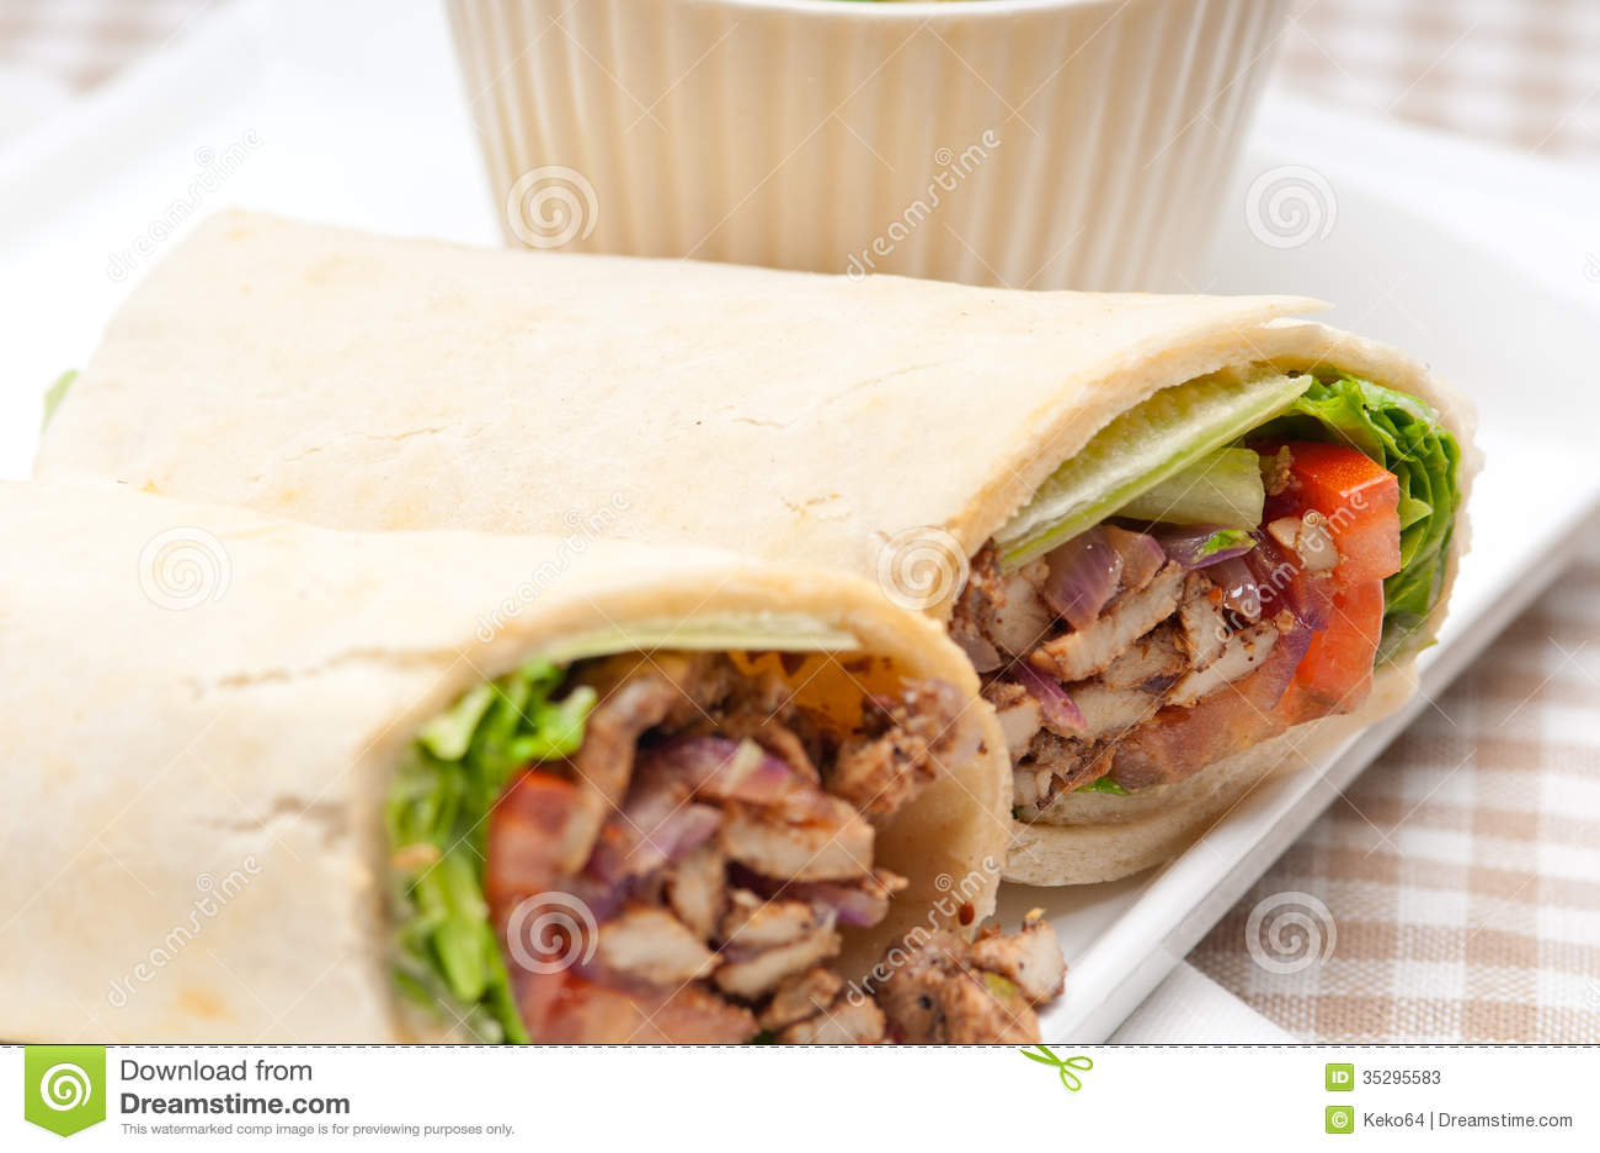 kafta shawarma chicken pita wrap roll sandwich stock image image 35295583. Black Bedroom Furniture Sets. Home Design Ideas